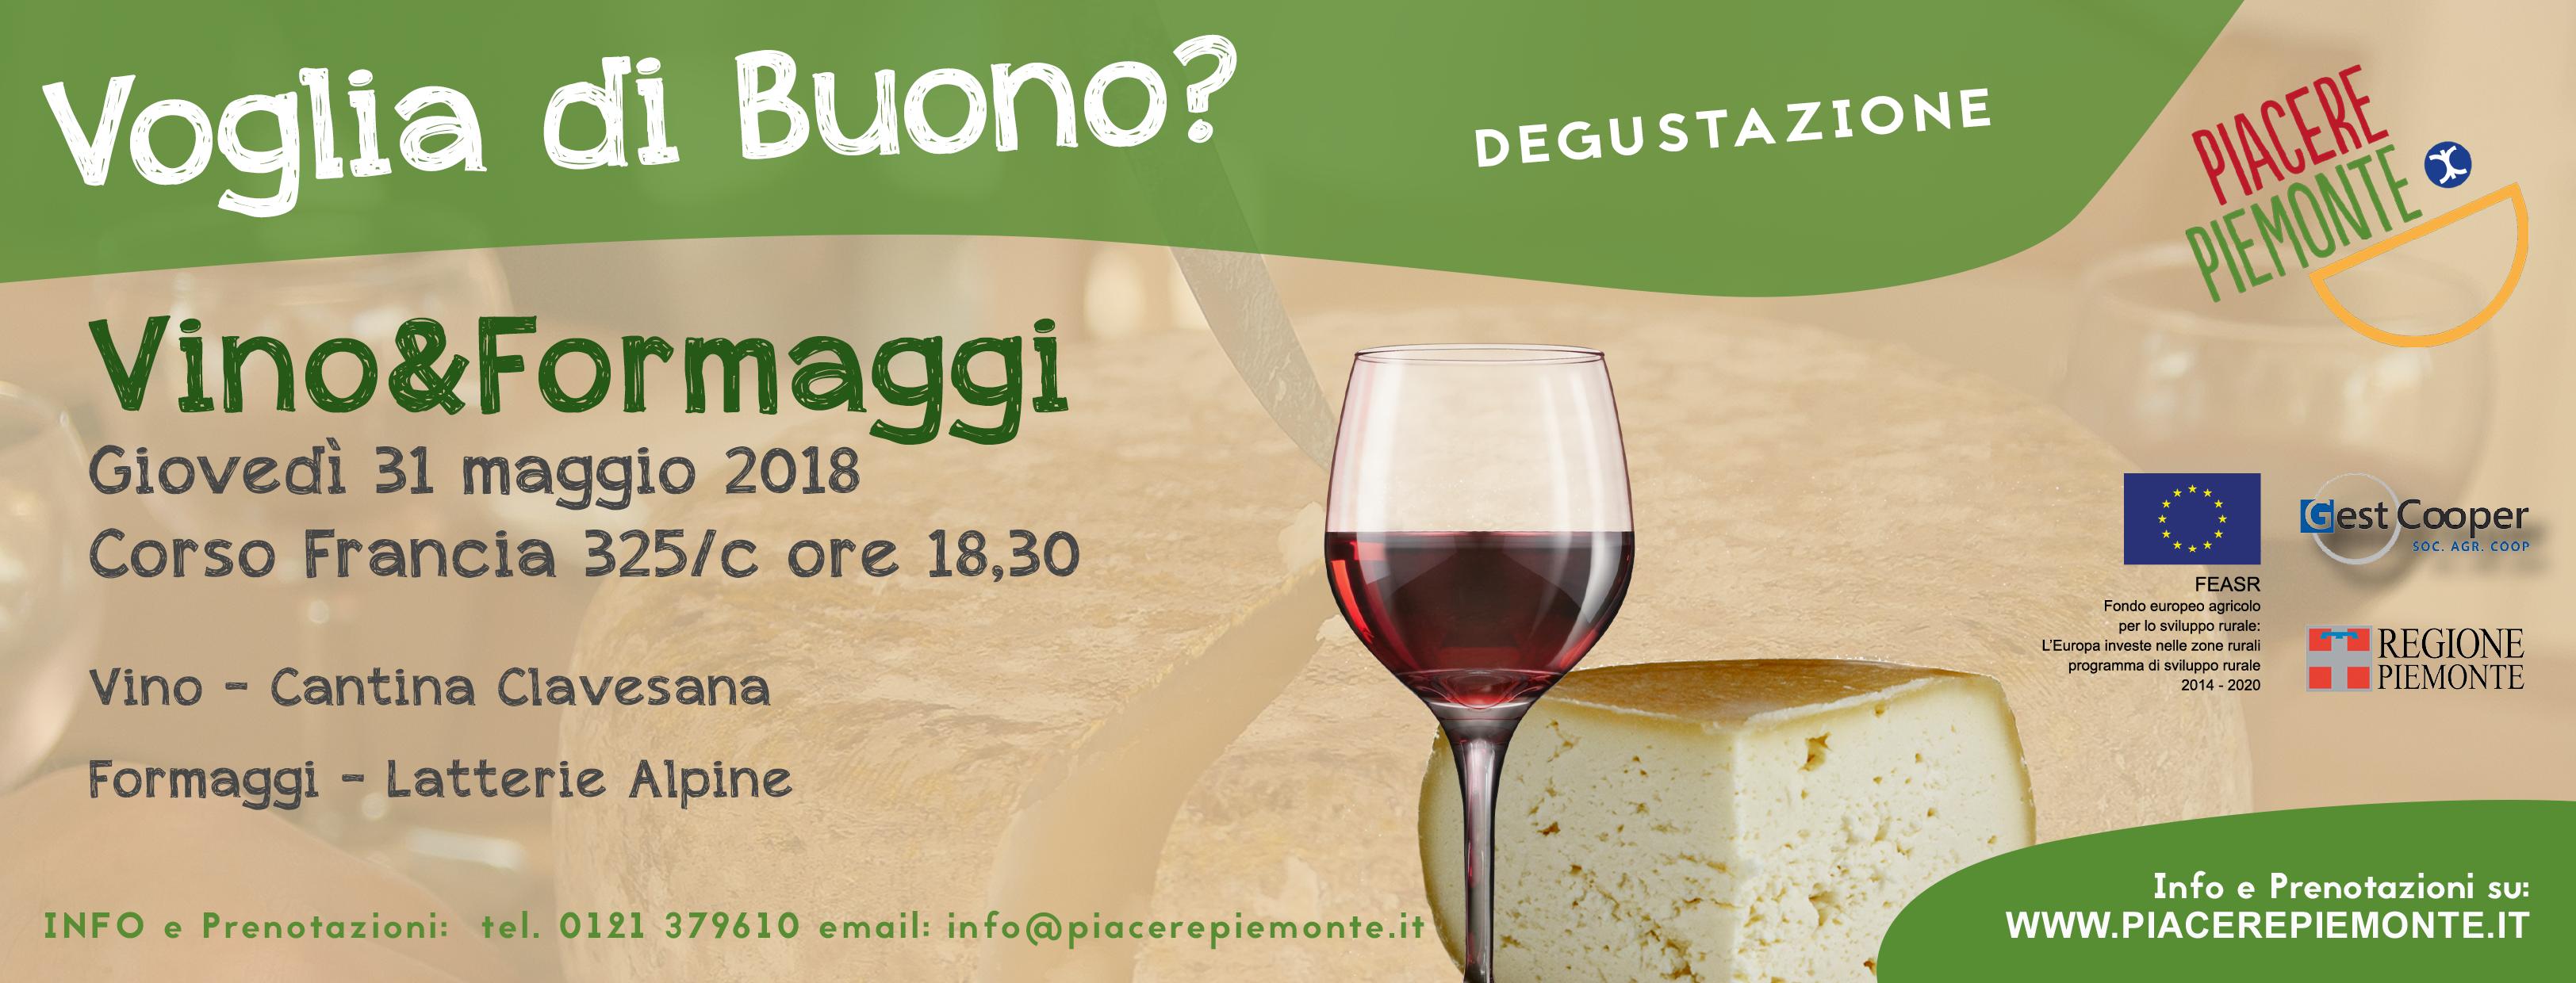 PP_31maggio2018_vinoformaggi